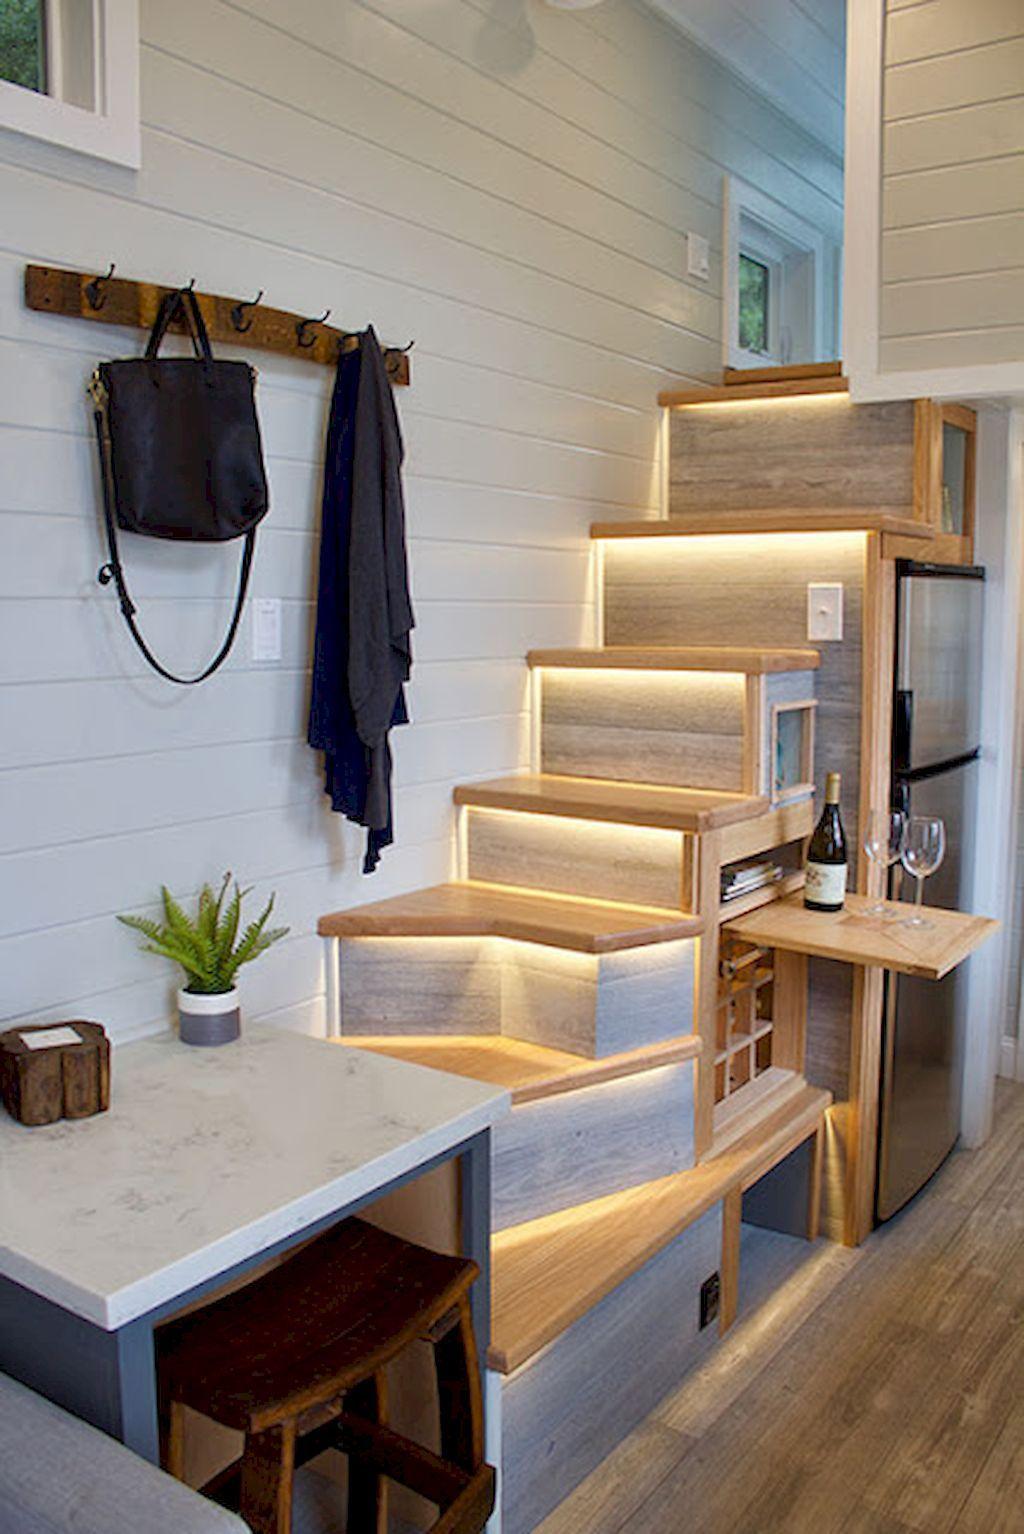 Genius Tiny House Bathroom Design Ideas 47 Tiny House Stairs Tiny House Interior Tiny House Design